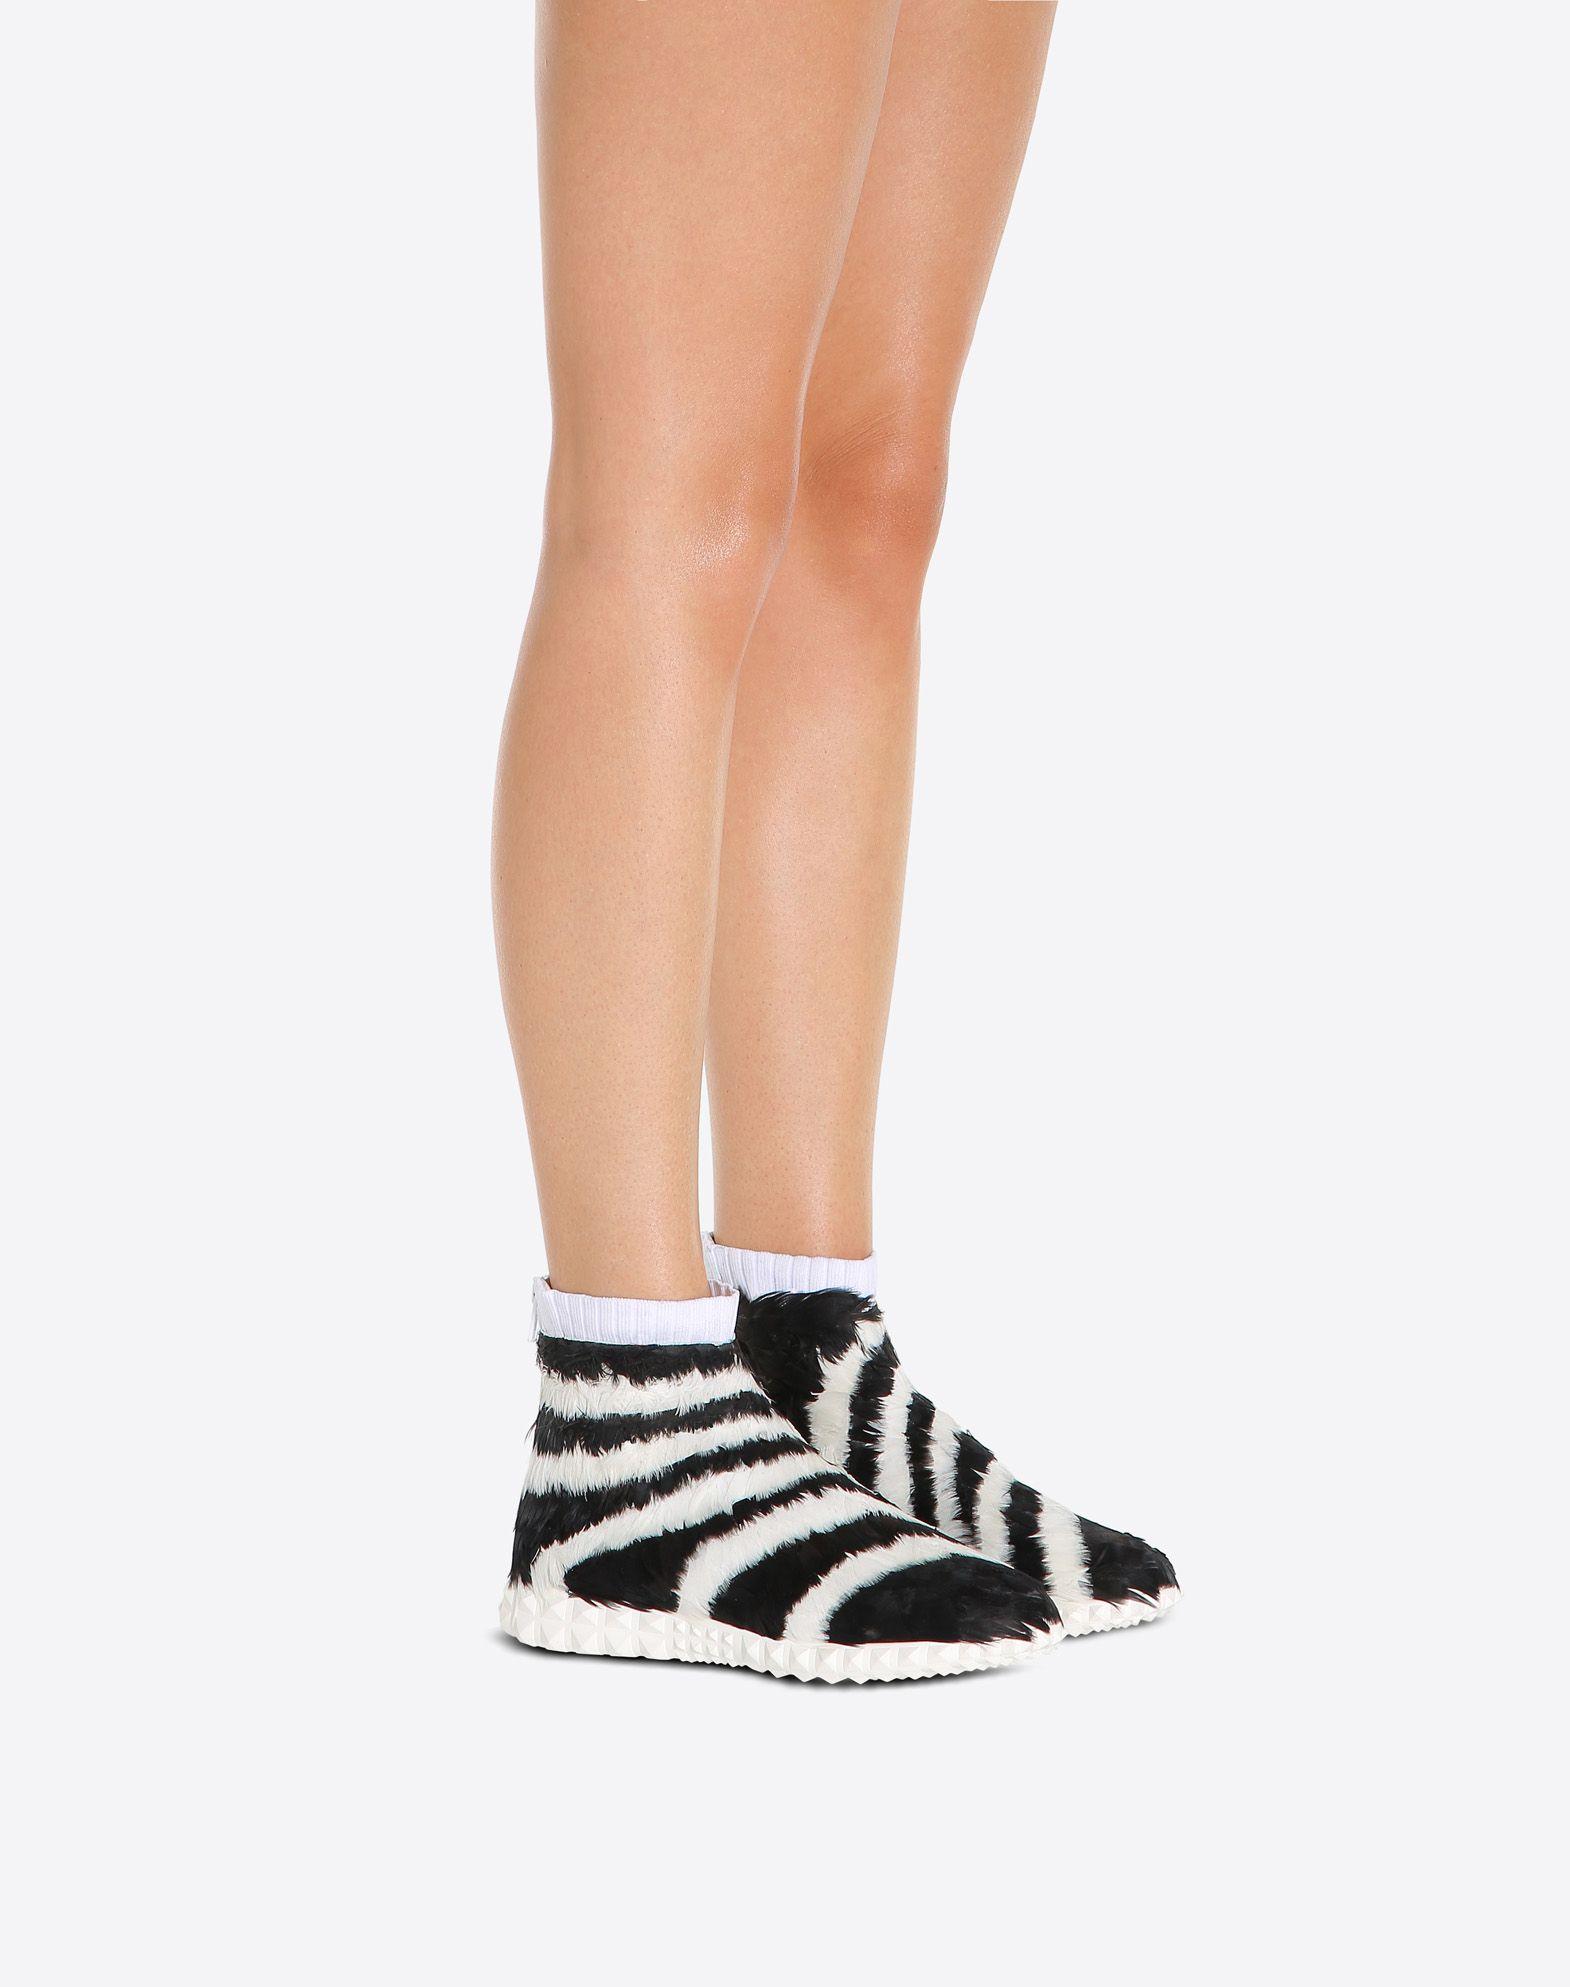 VALENTINO GARAVANI Sneakers con plumas SNEAKERS ALTAS D a